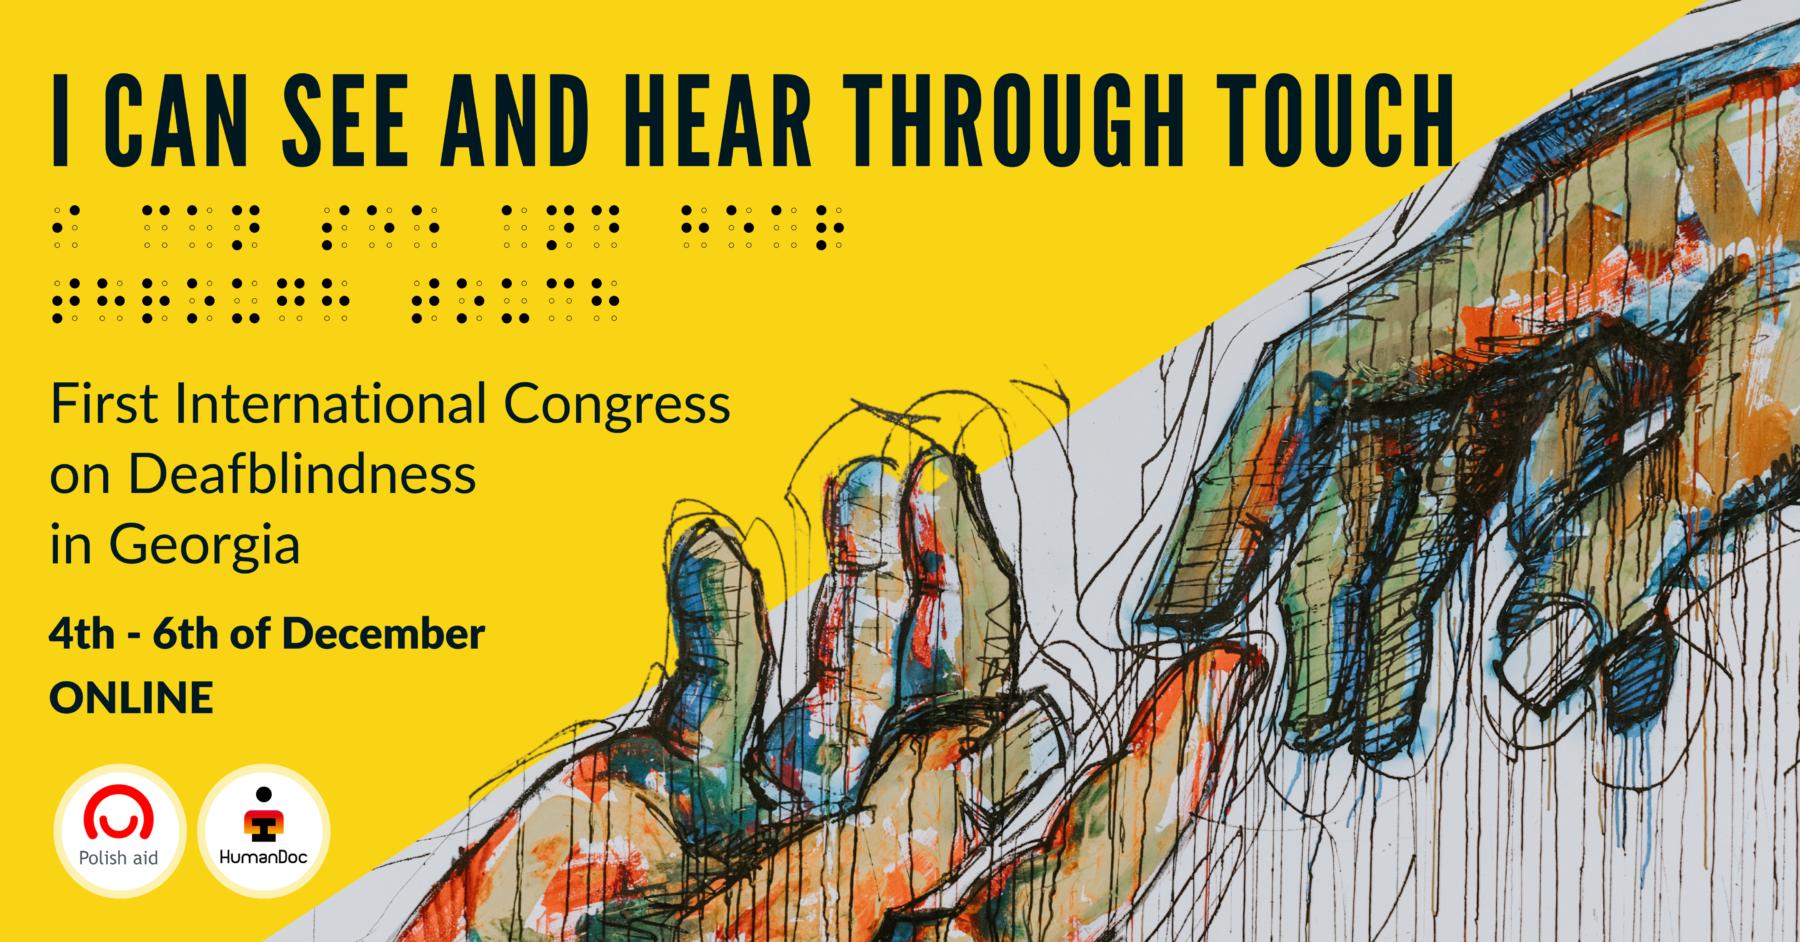 kongres zdjecie eventu ENG Georgian Union Of DeafBlind